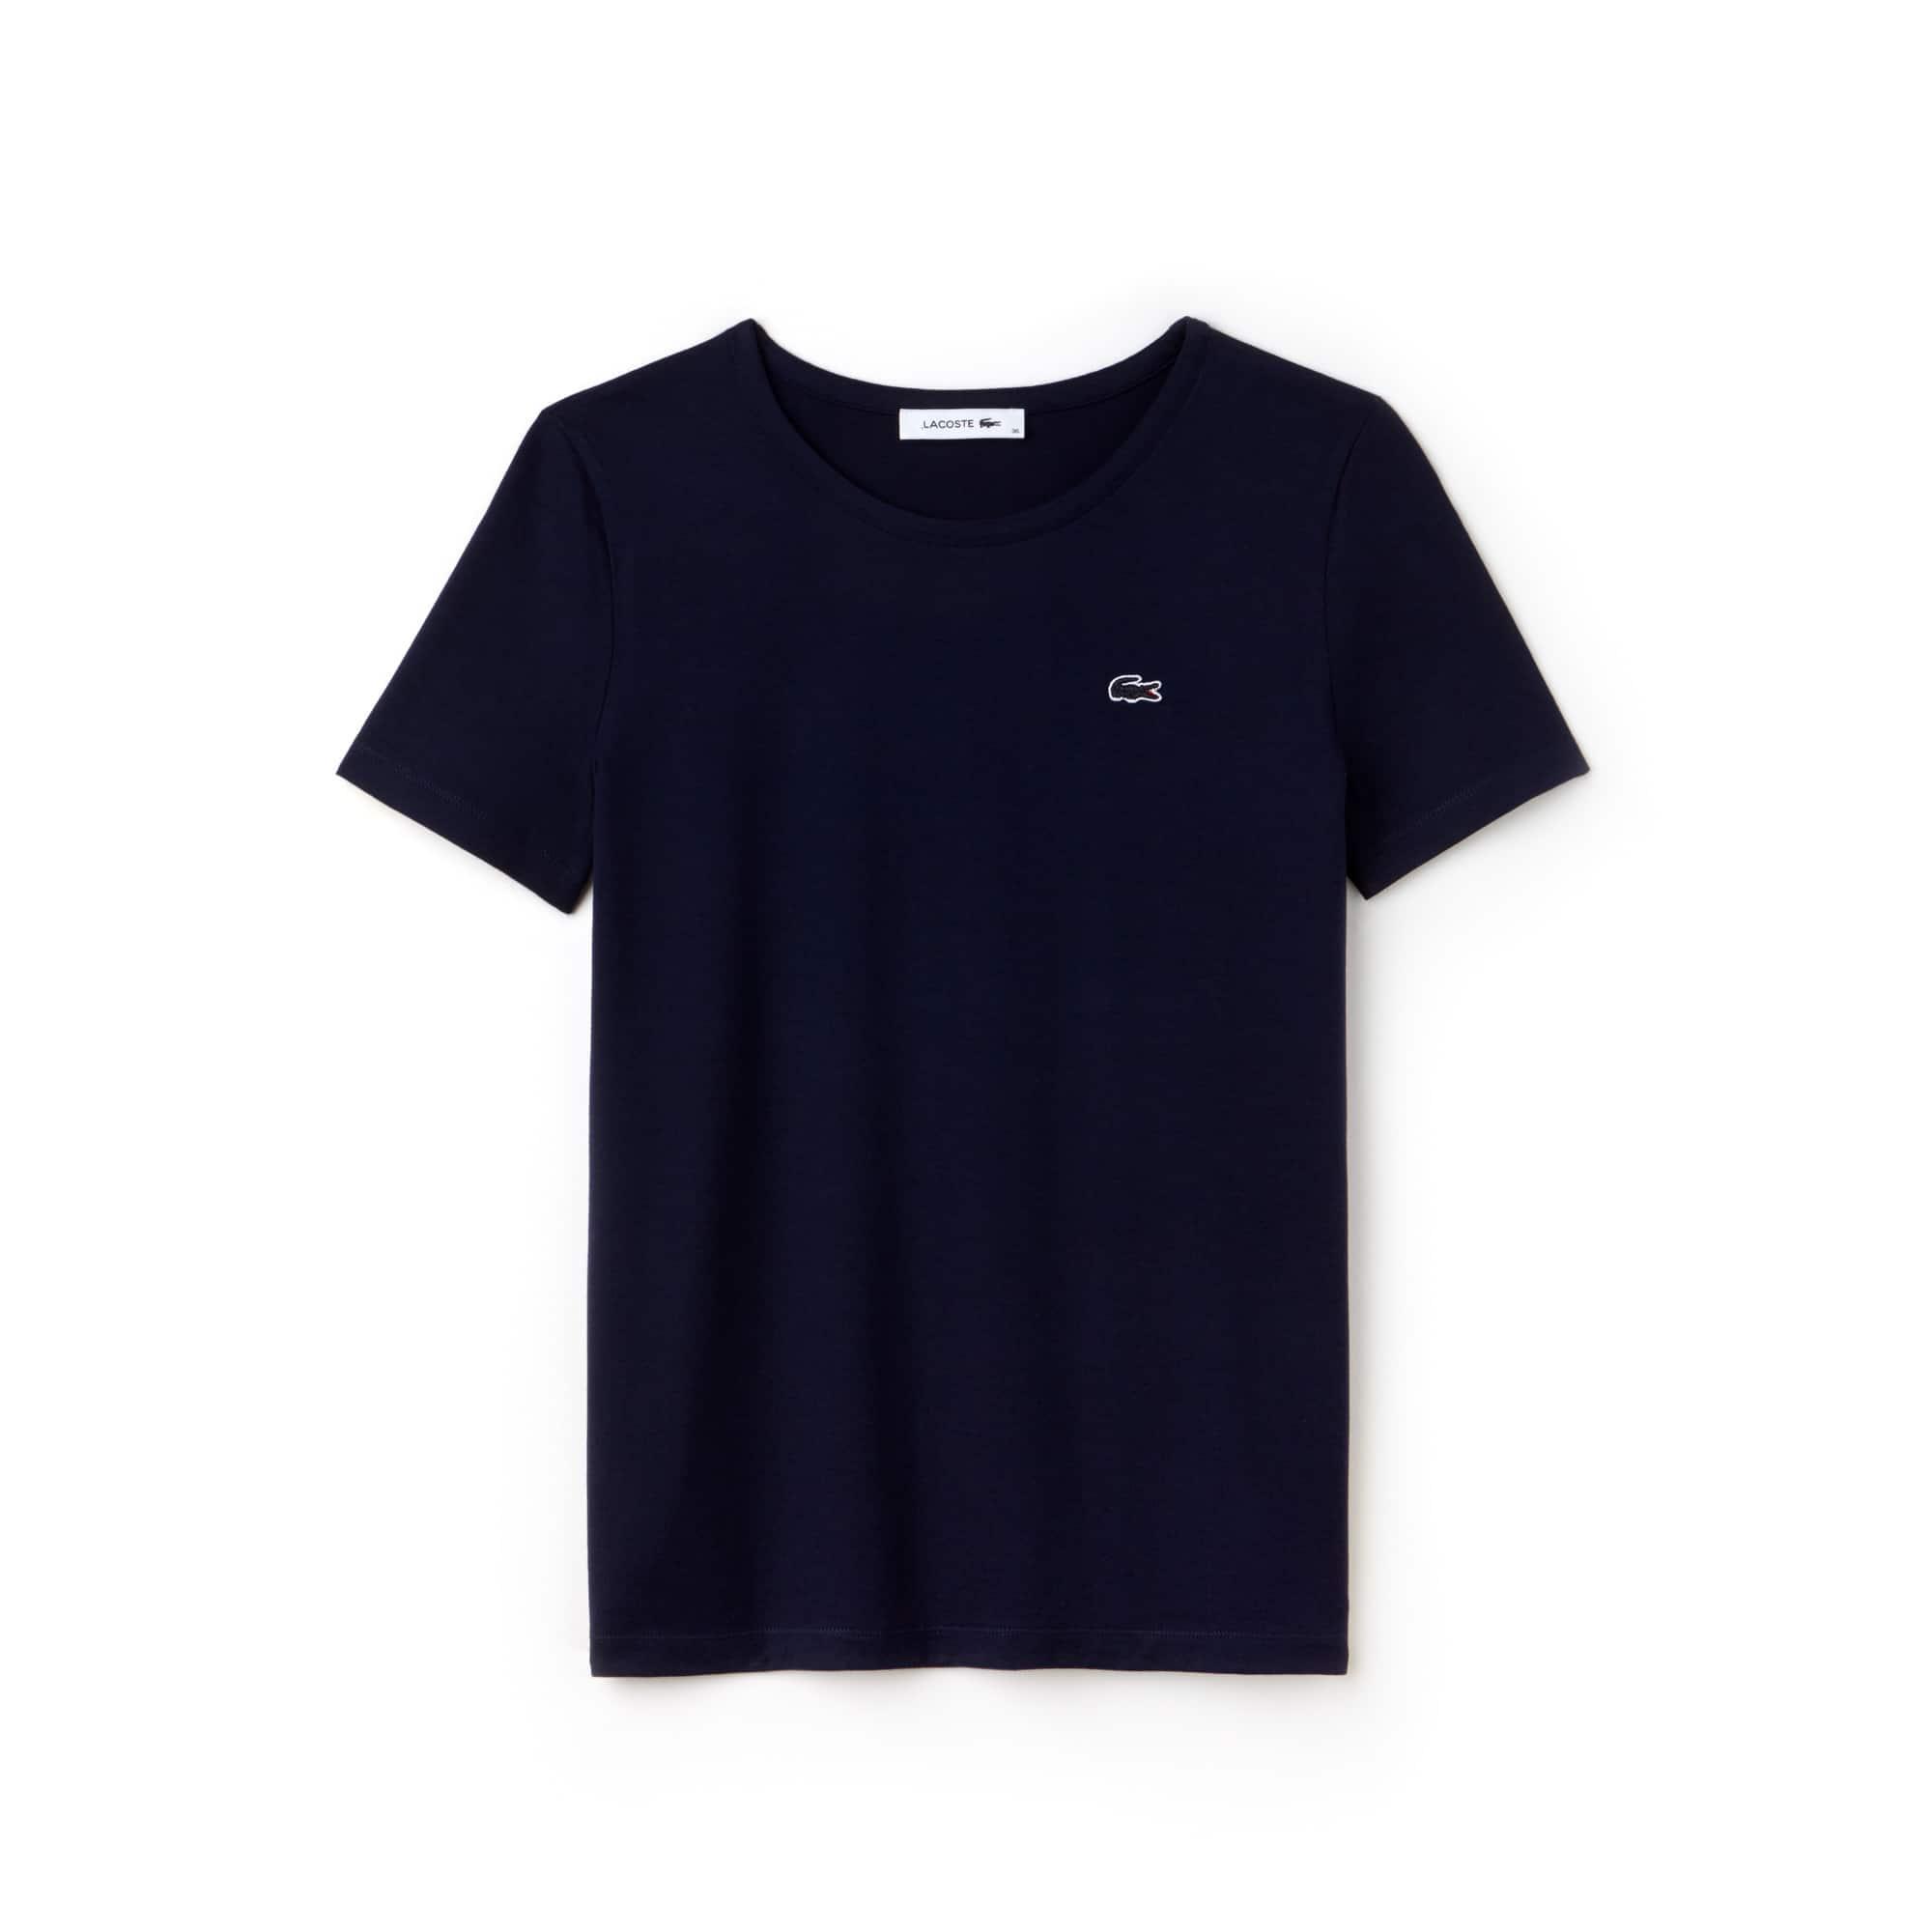 Women's Crew Neck Flowing Cotton Jersey T-shirt